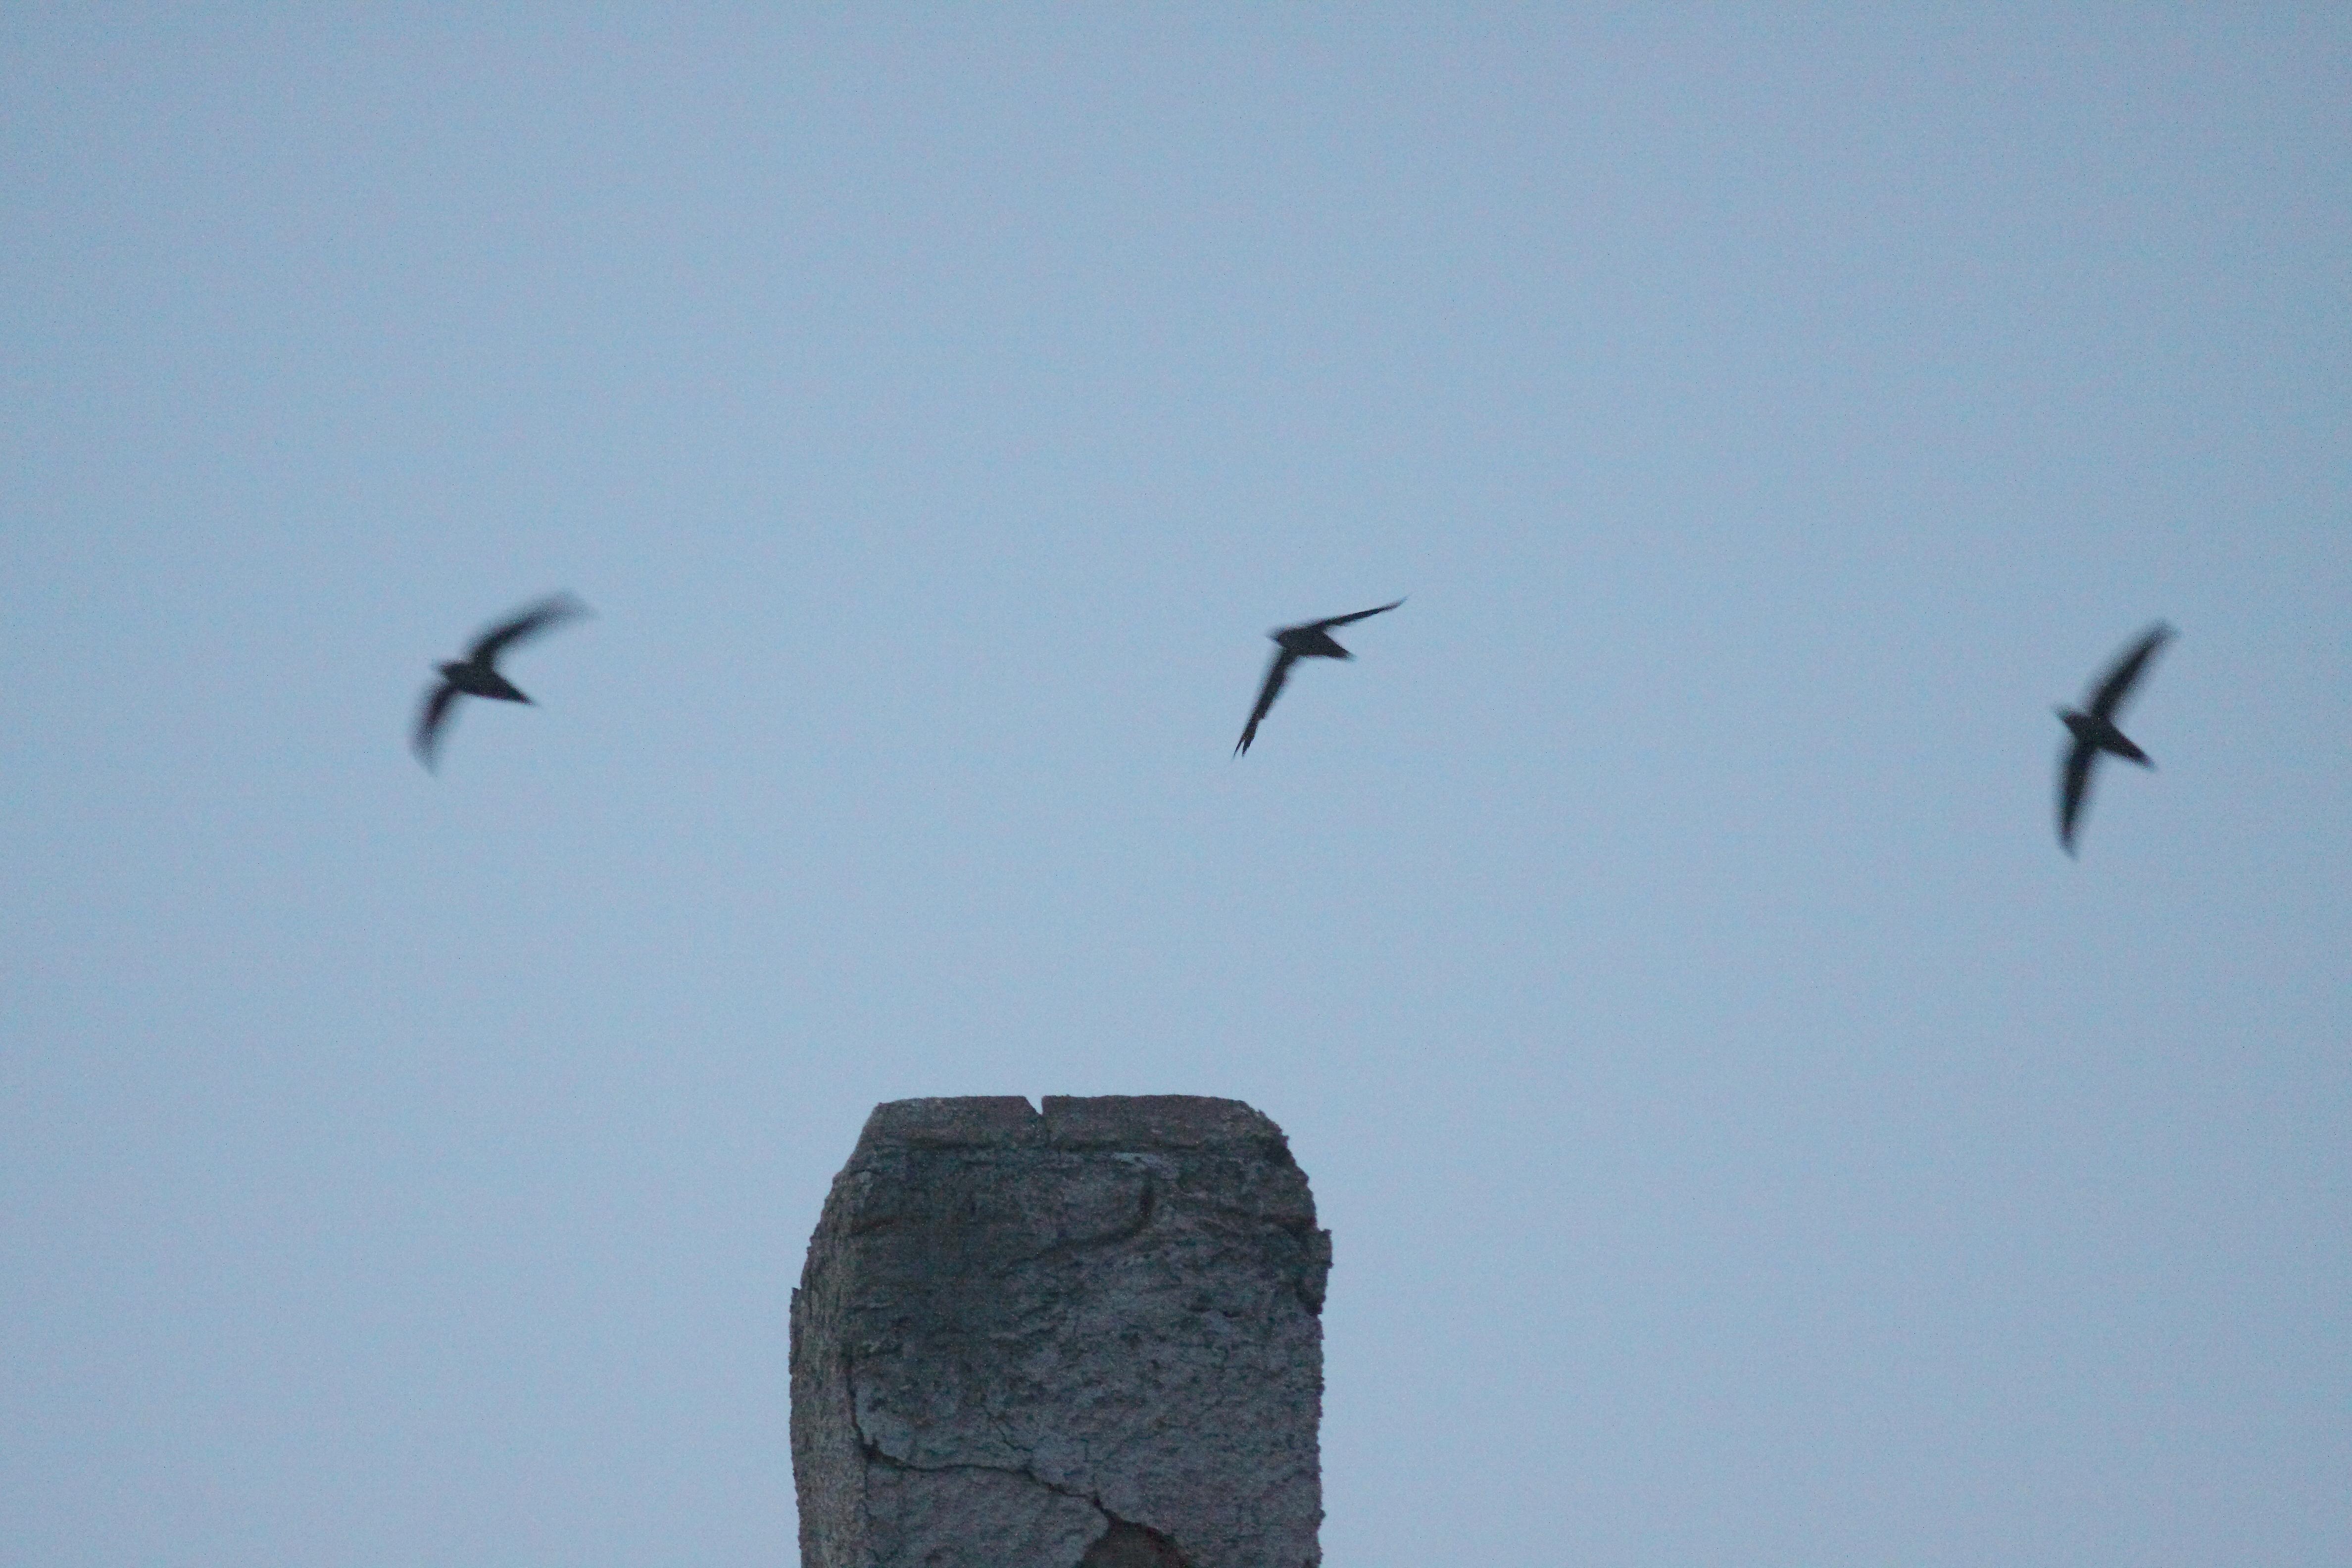 3 CHSW_Hampton chimney_1461_blurred